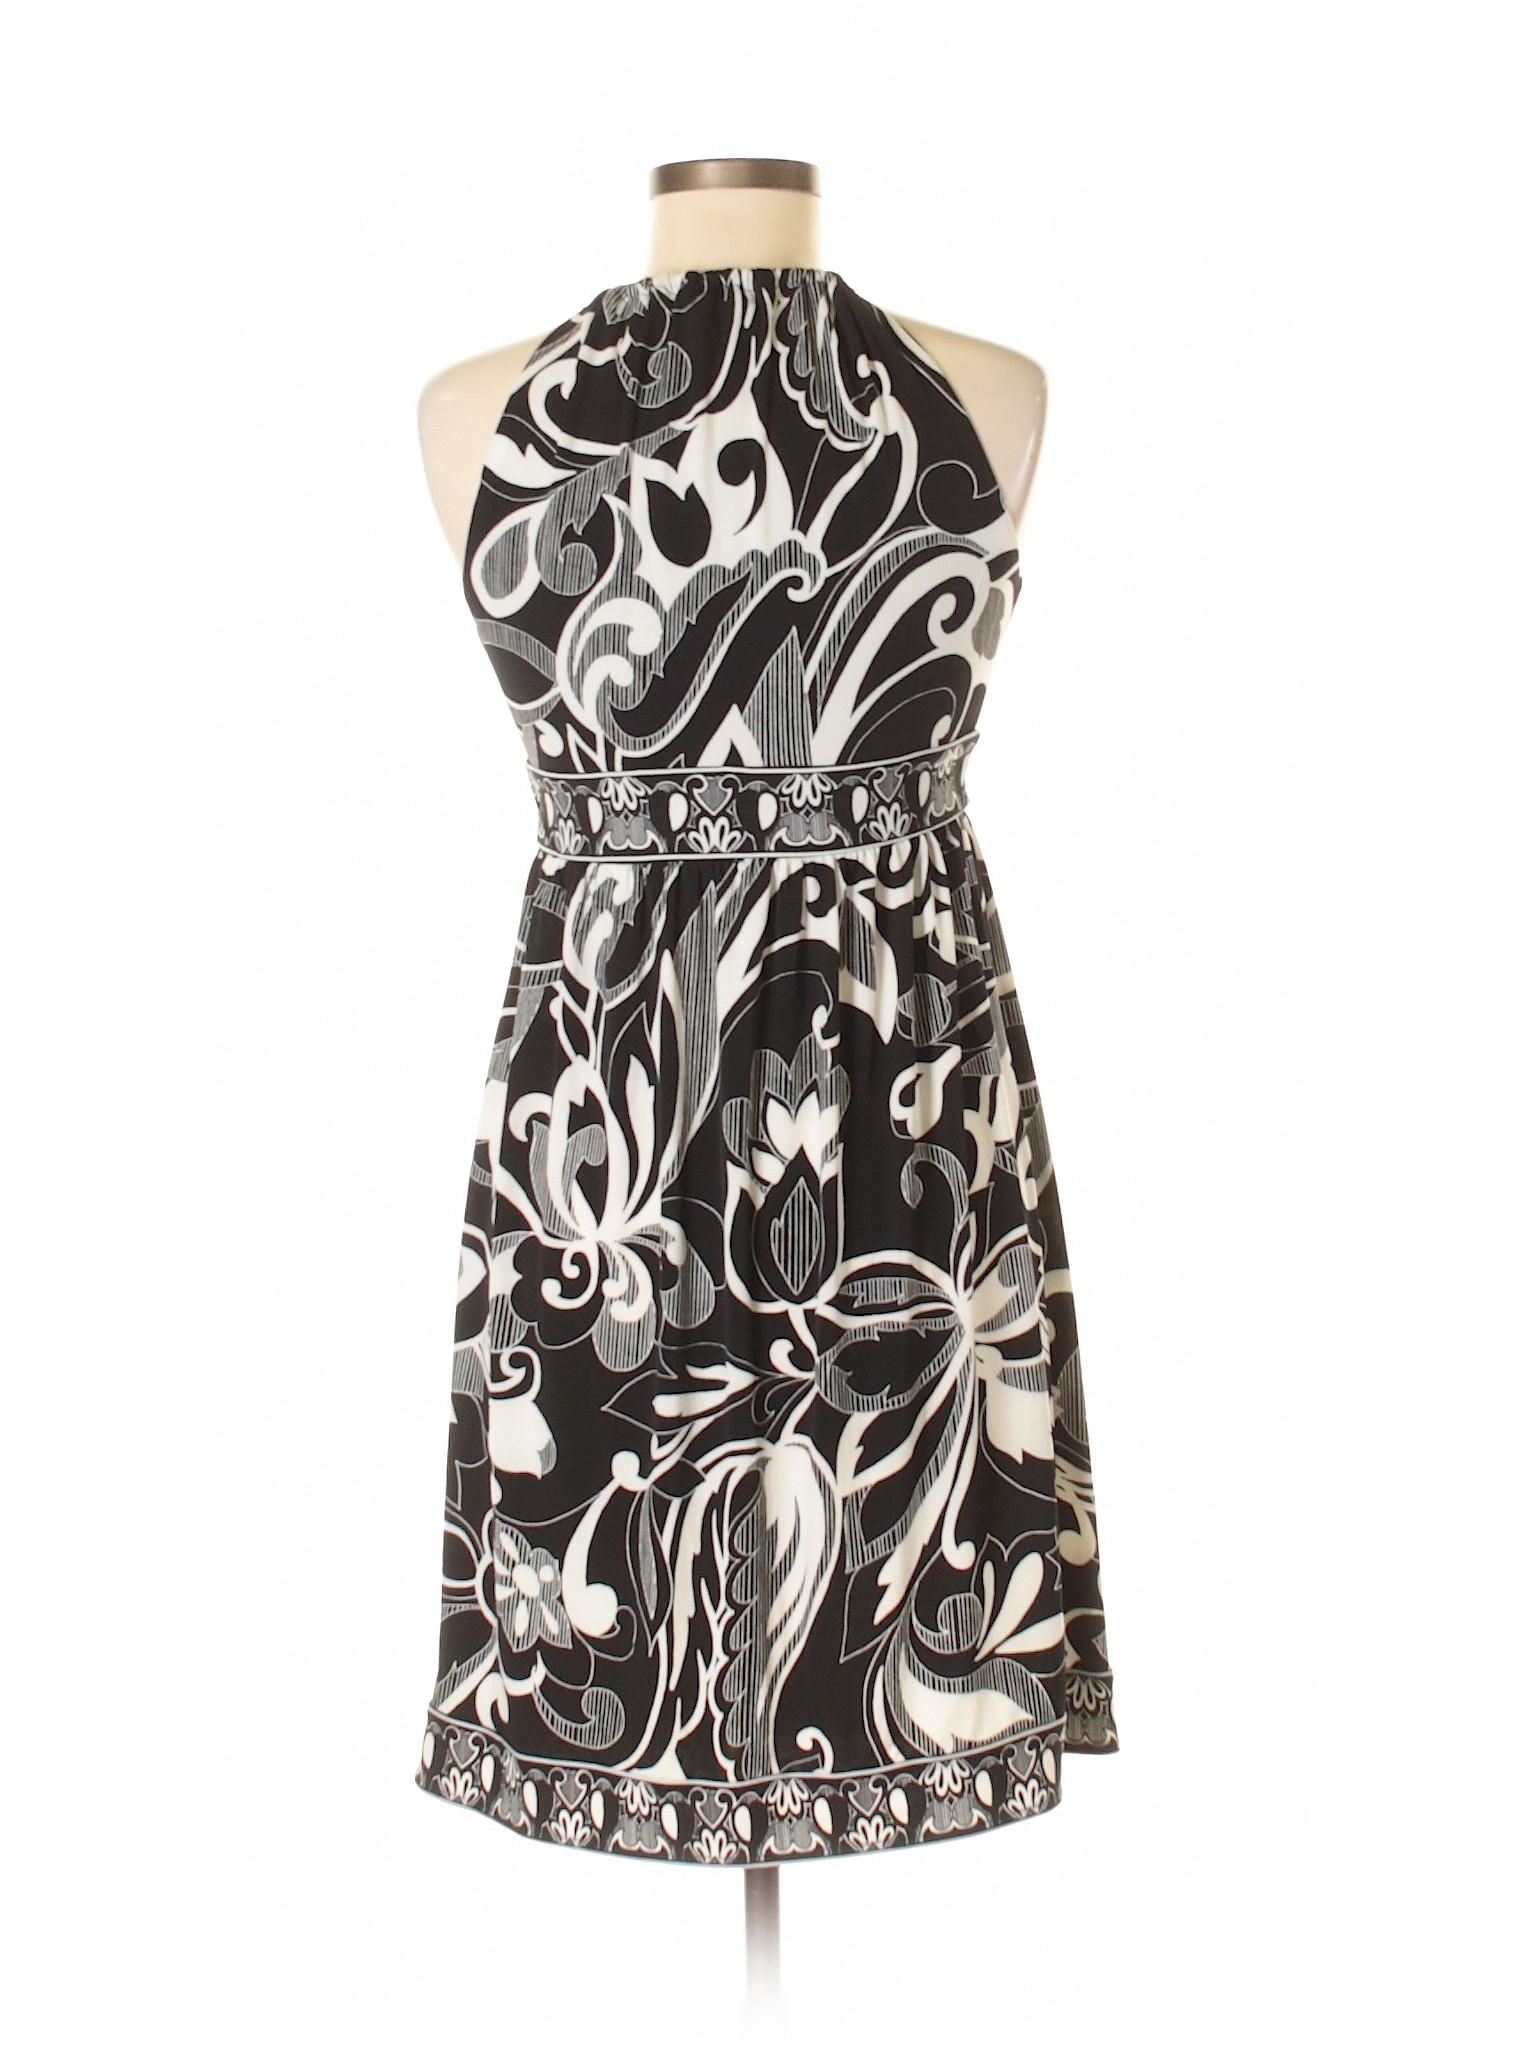 Times Boutique Casual winter Dress London rqnxZTrwE